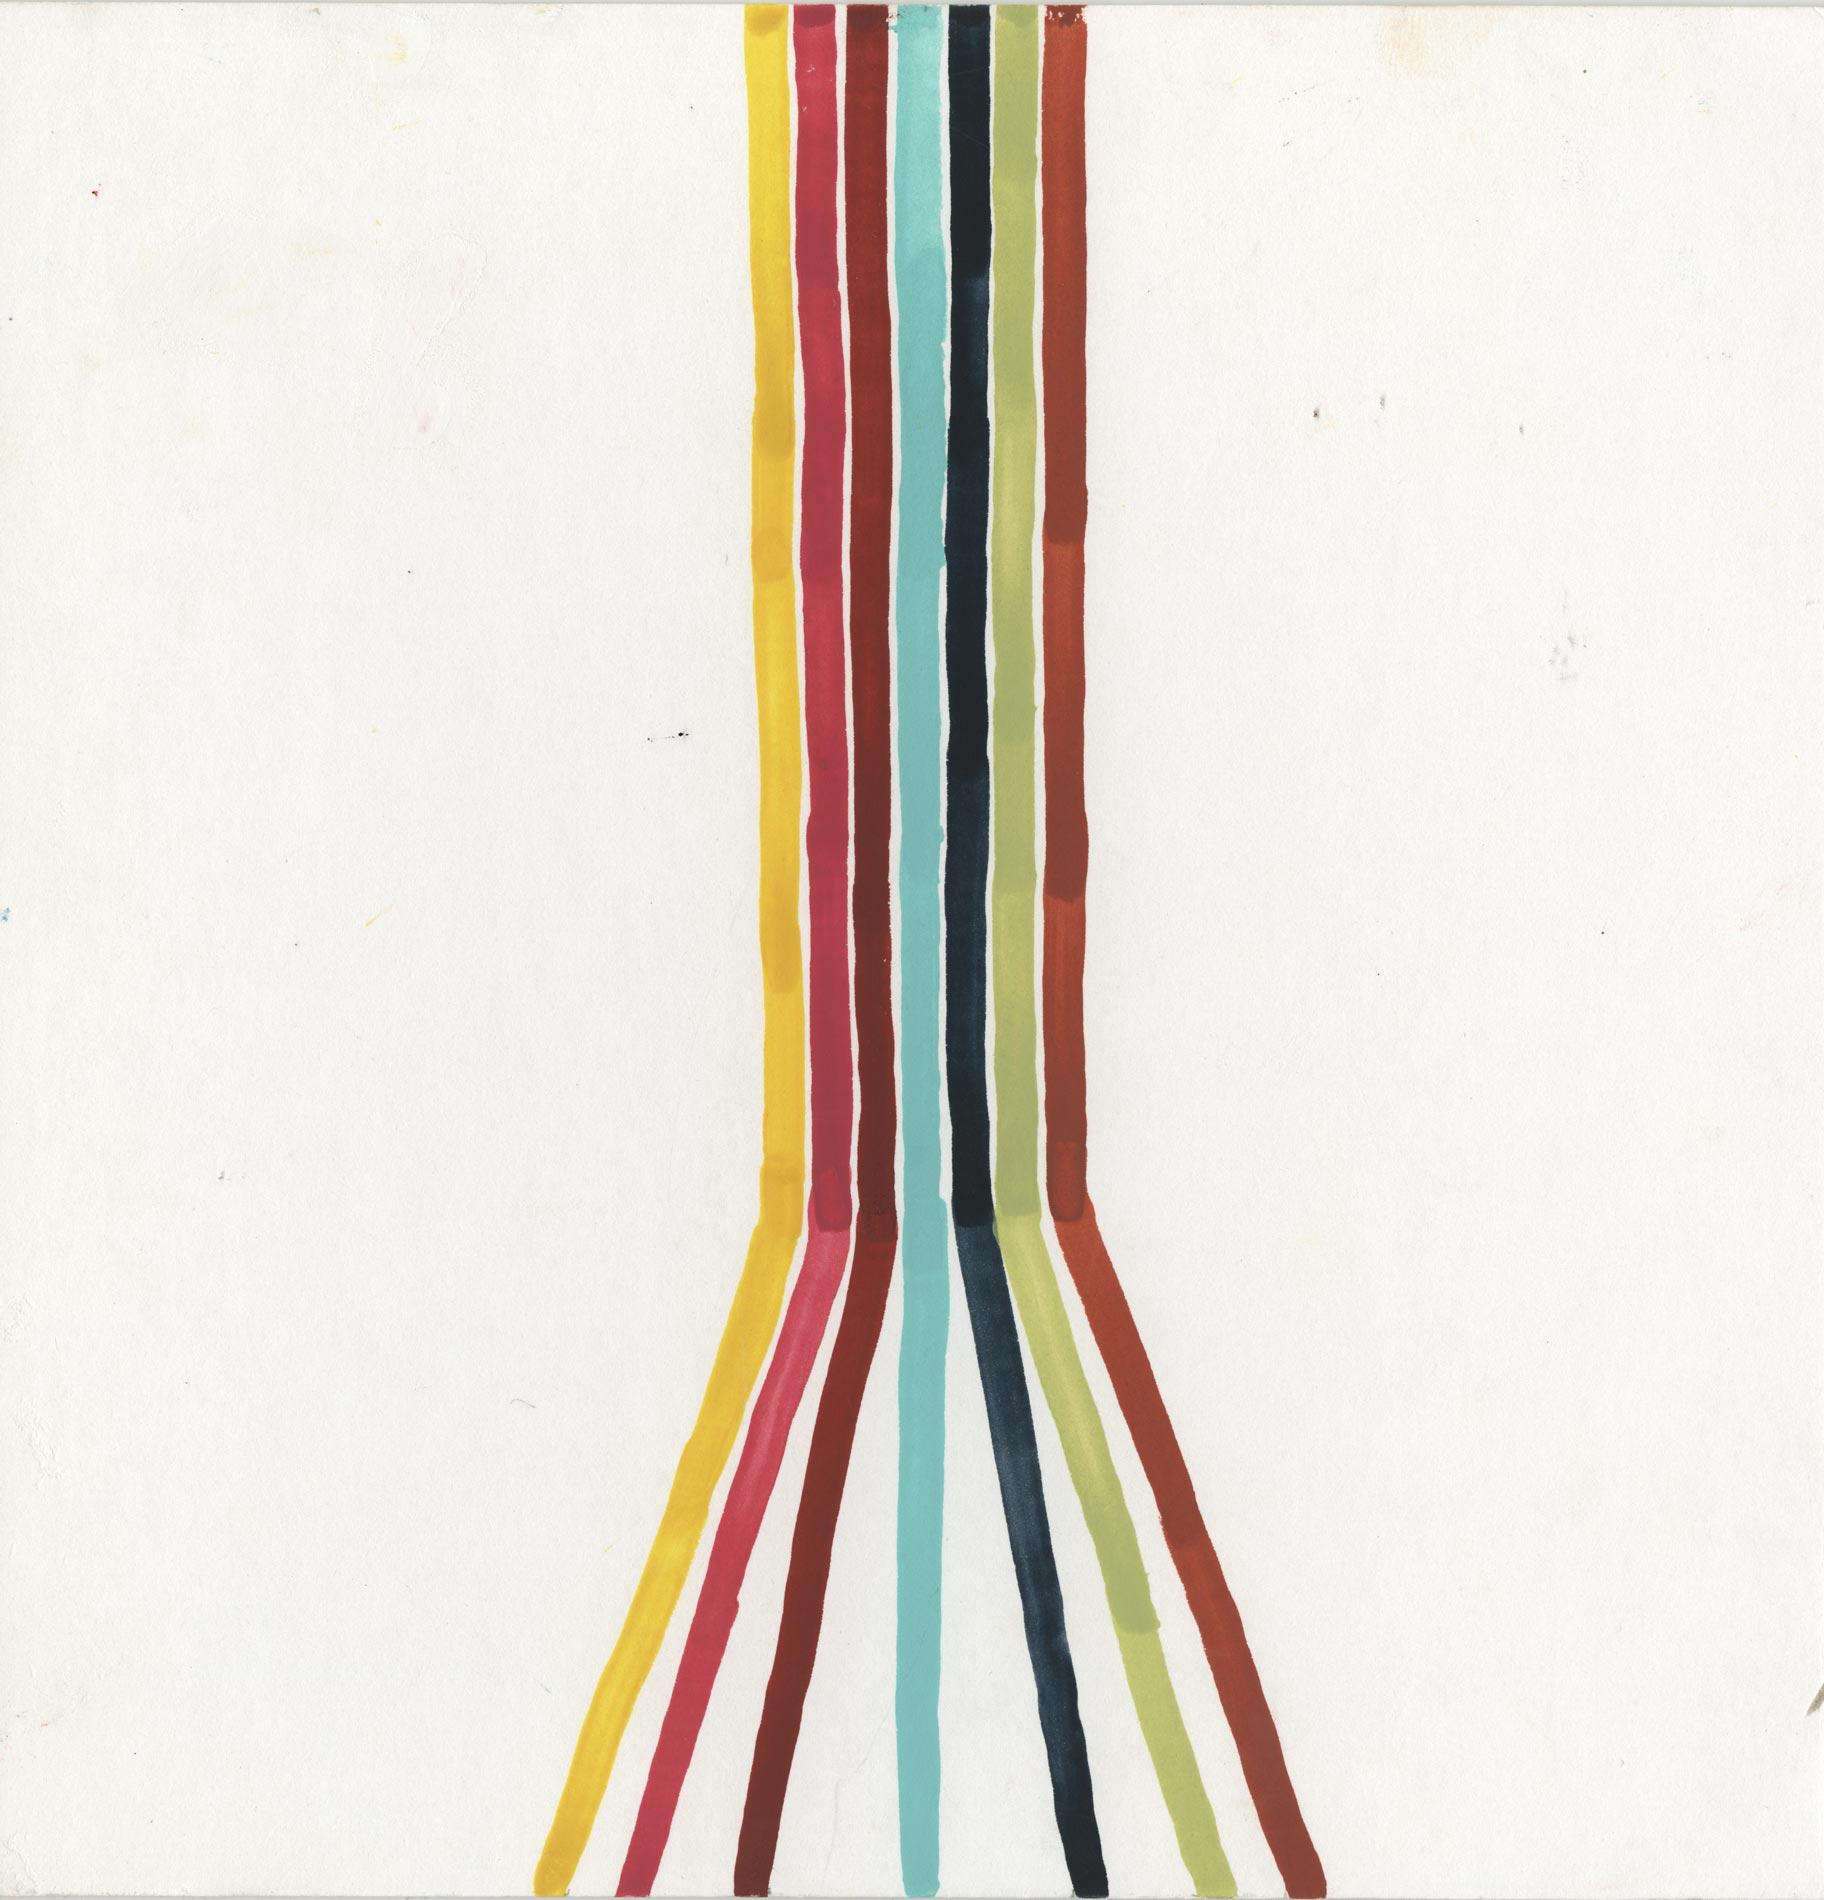 zig-zag-rainbow-sold.jpg